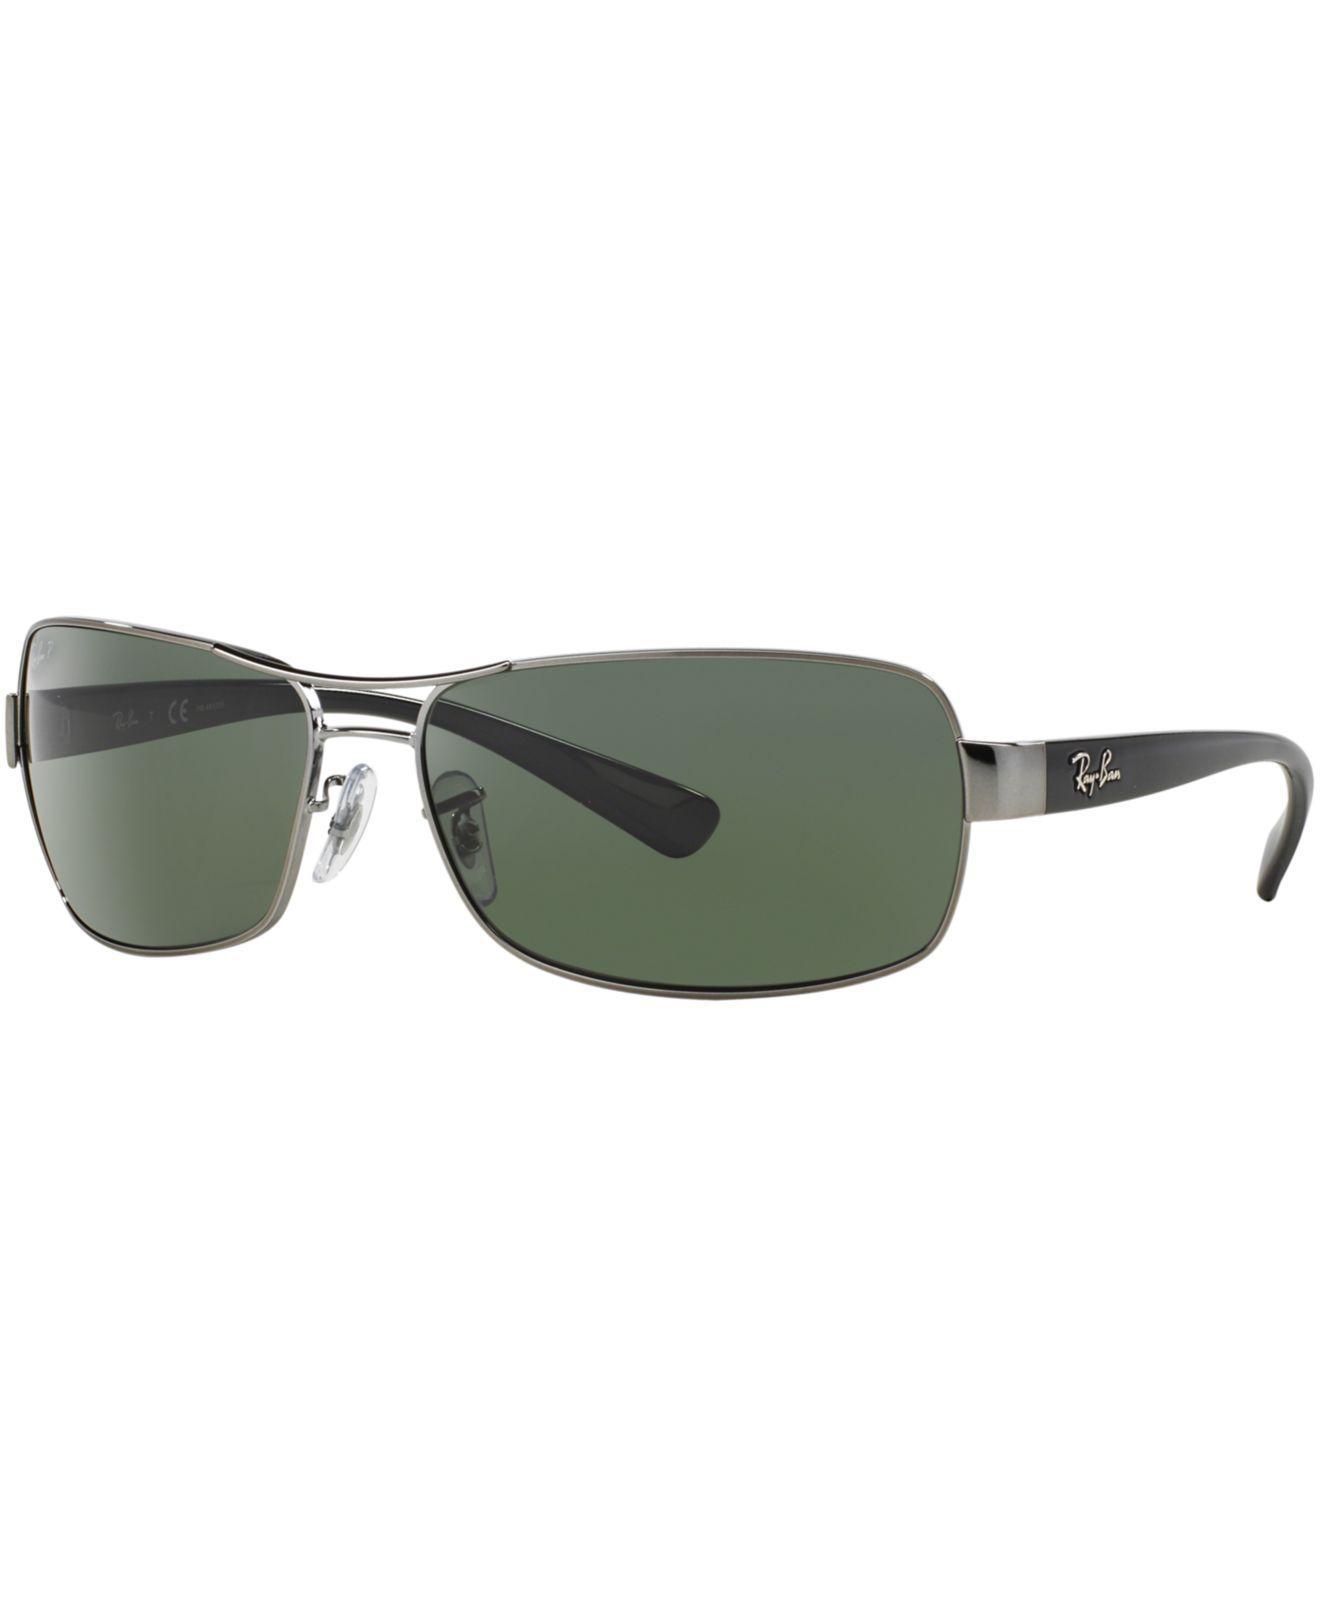 eb7c38ae68 Ray-Ban. Men s Metallic Sunglasses ...